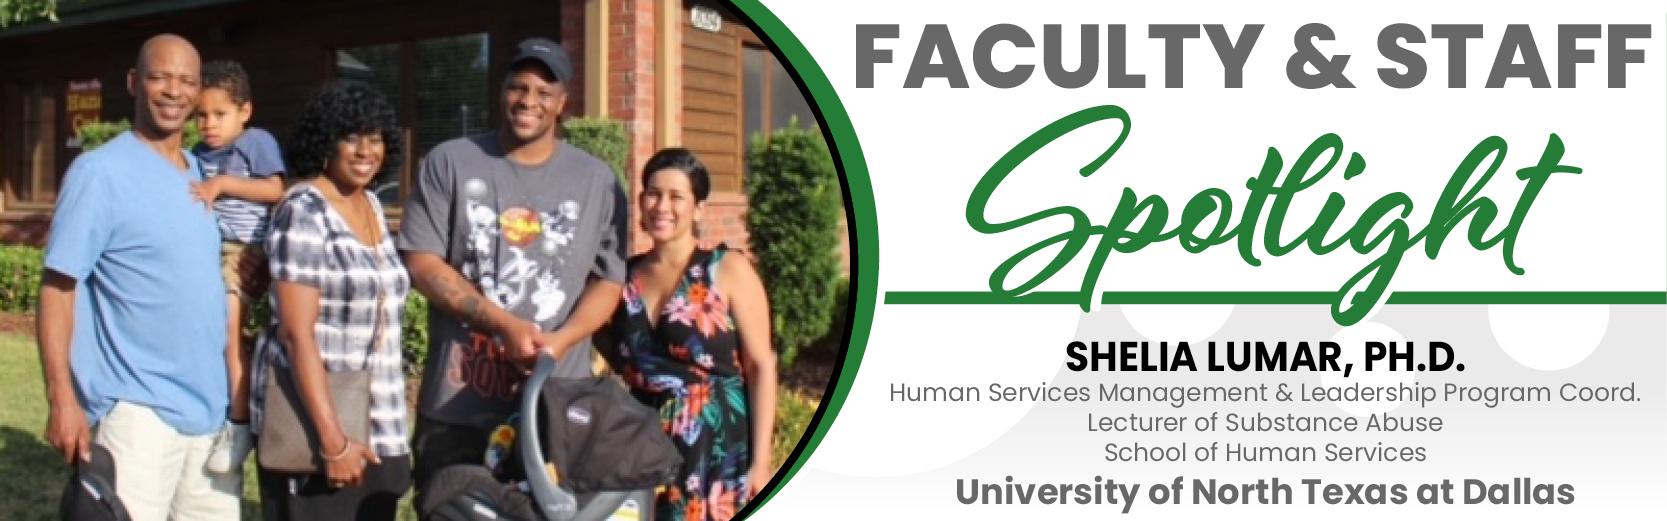 Faculty & Staff Spotlight: Shelia Lumar, Ph.D, UNT Dallas